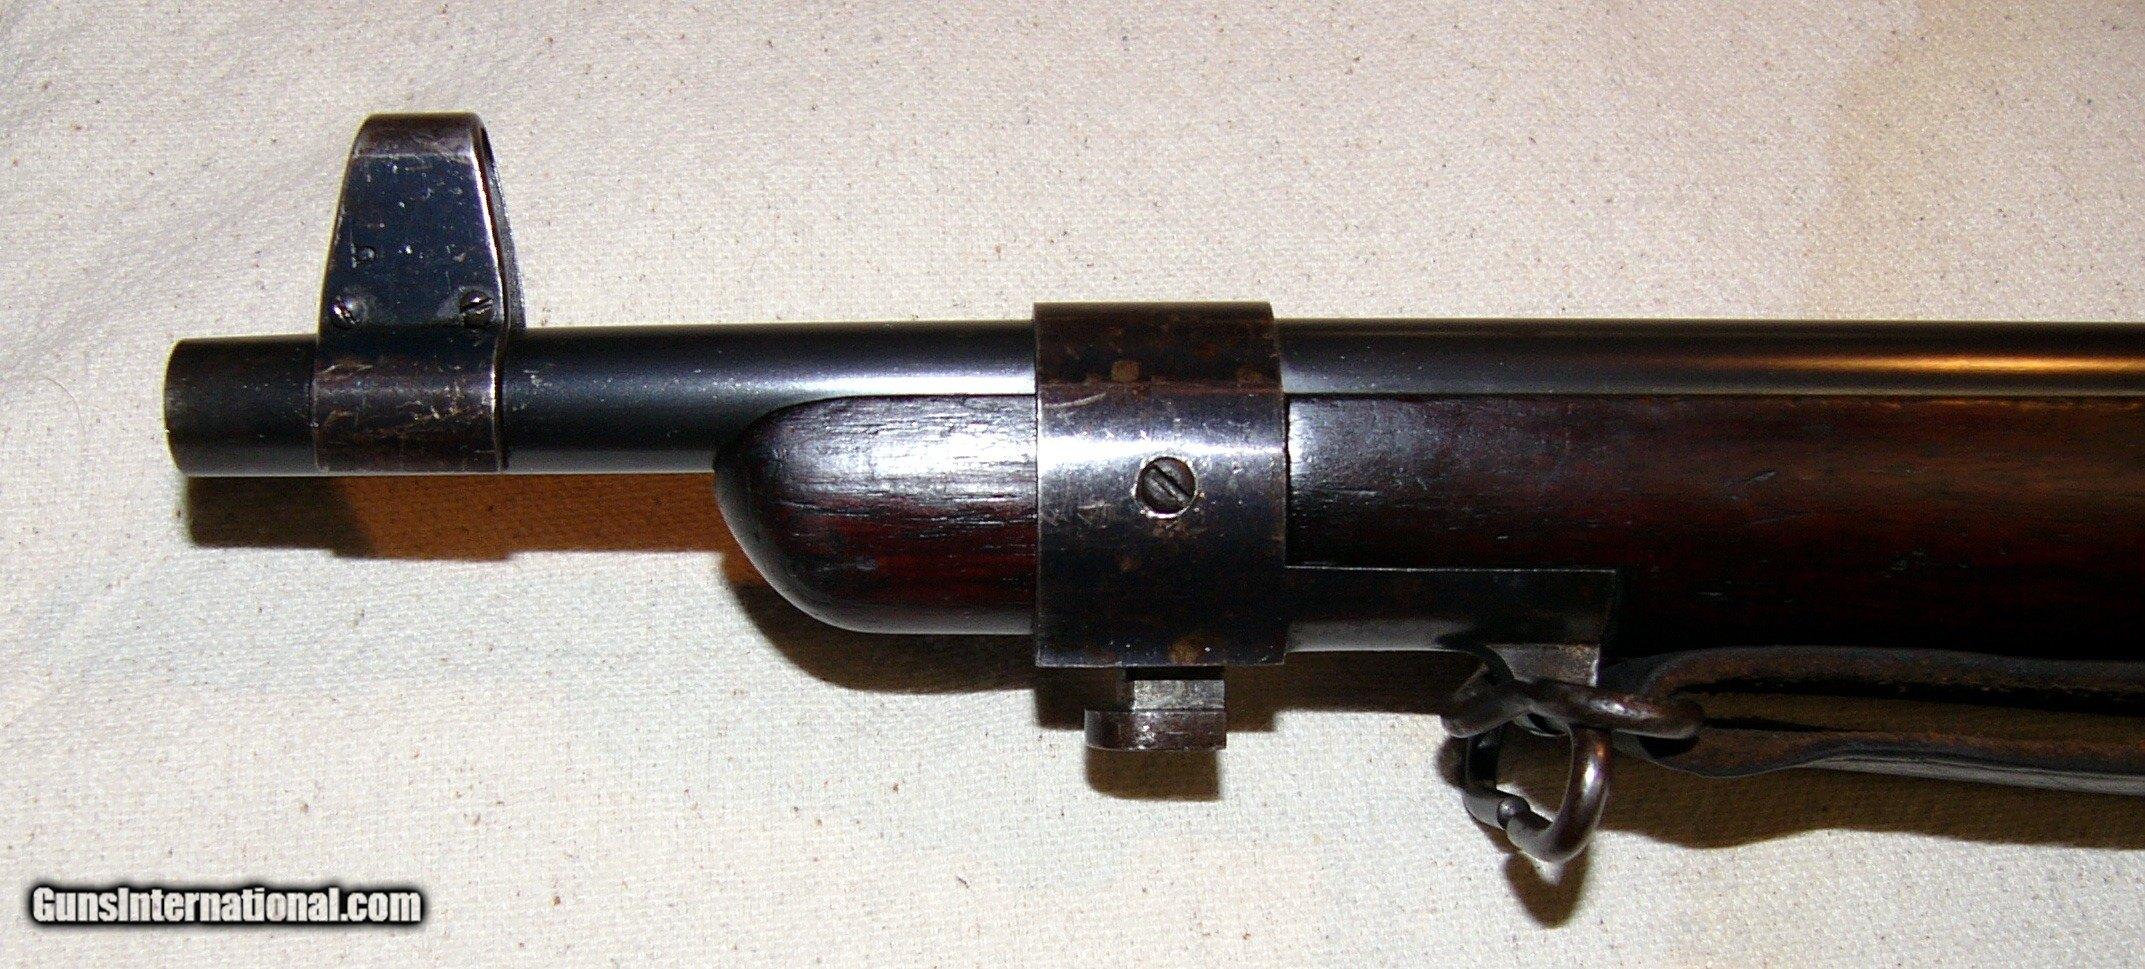 1 Original Model 1895 Winchester Lee Navy 6mm Sear Spring